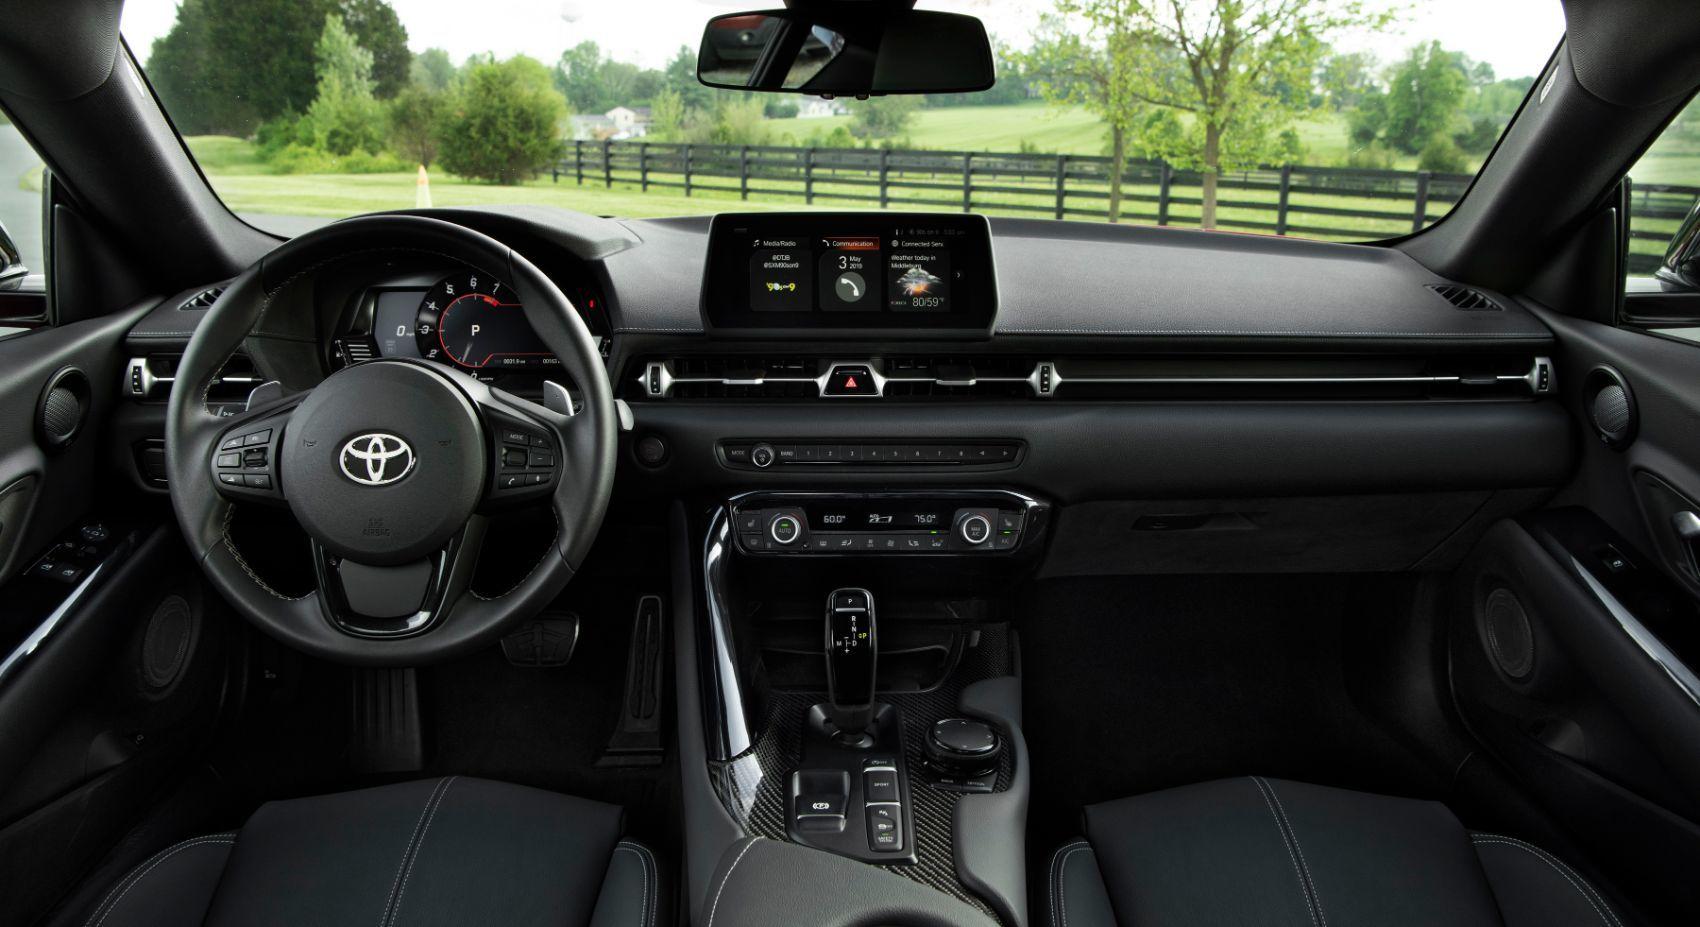 2020 Toyota Supra interior layout.